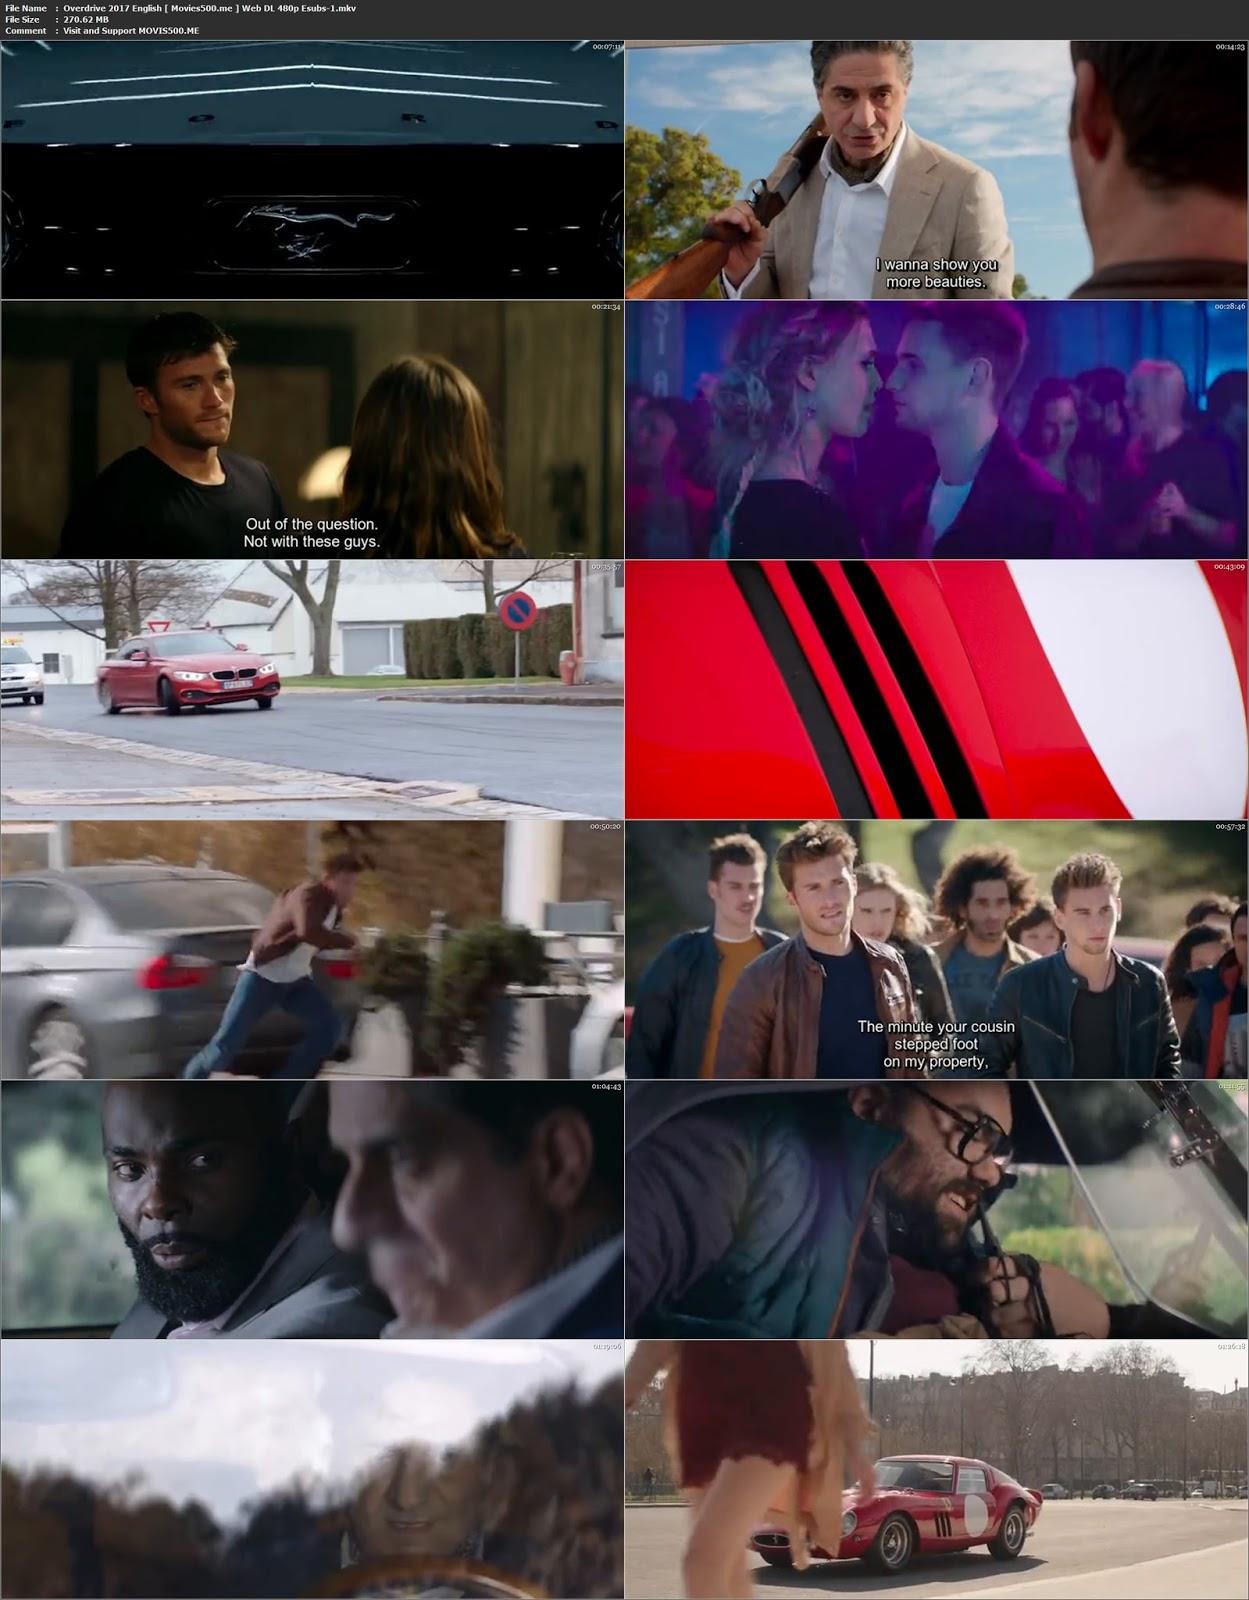 Overdrive 2017 Hollywood 270MB WEB DL 480p at gencoalumni.info